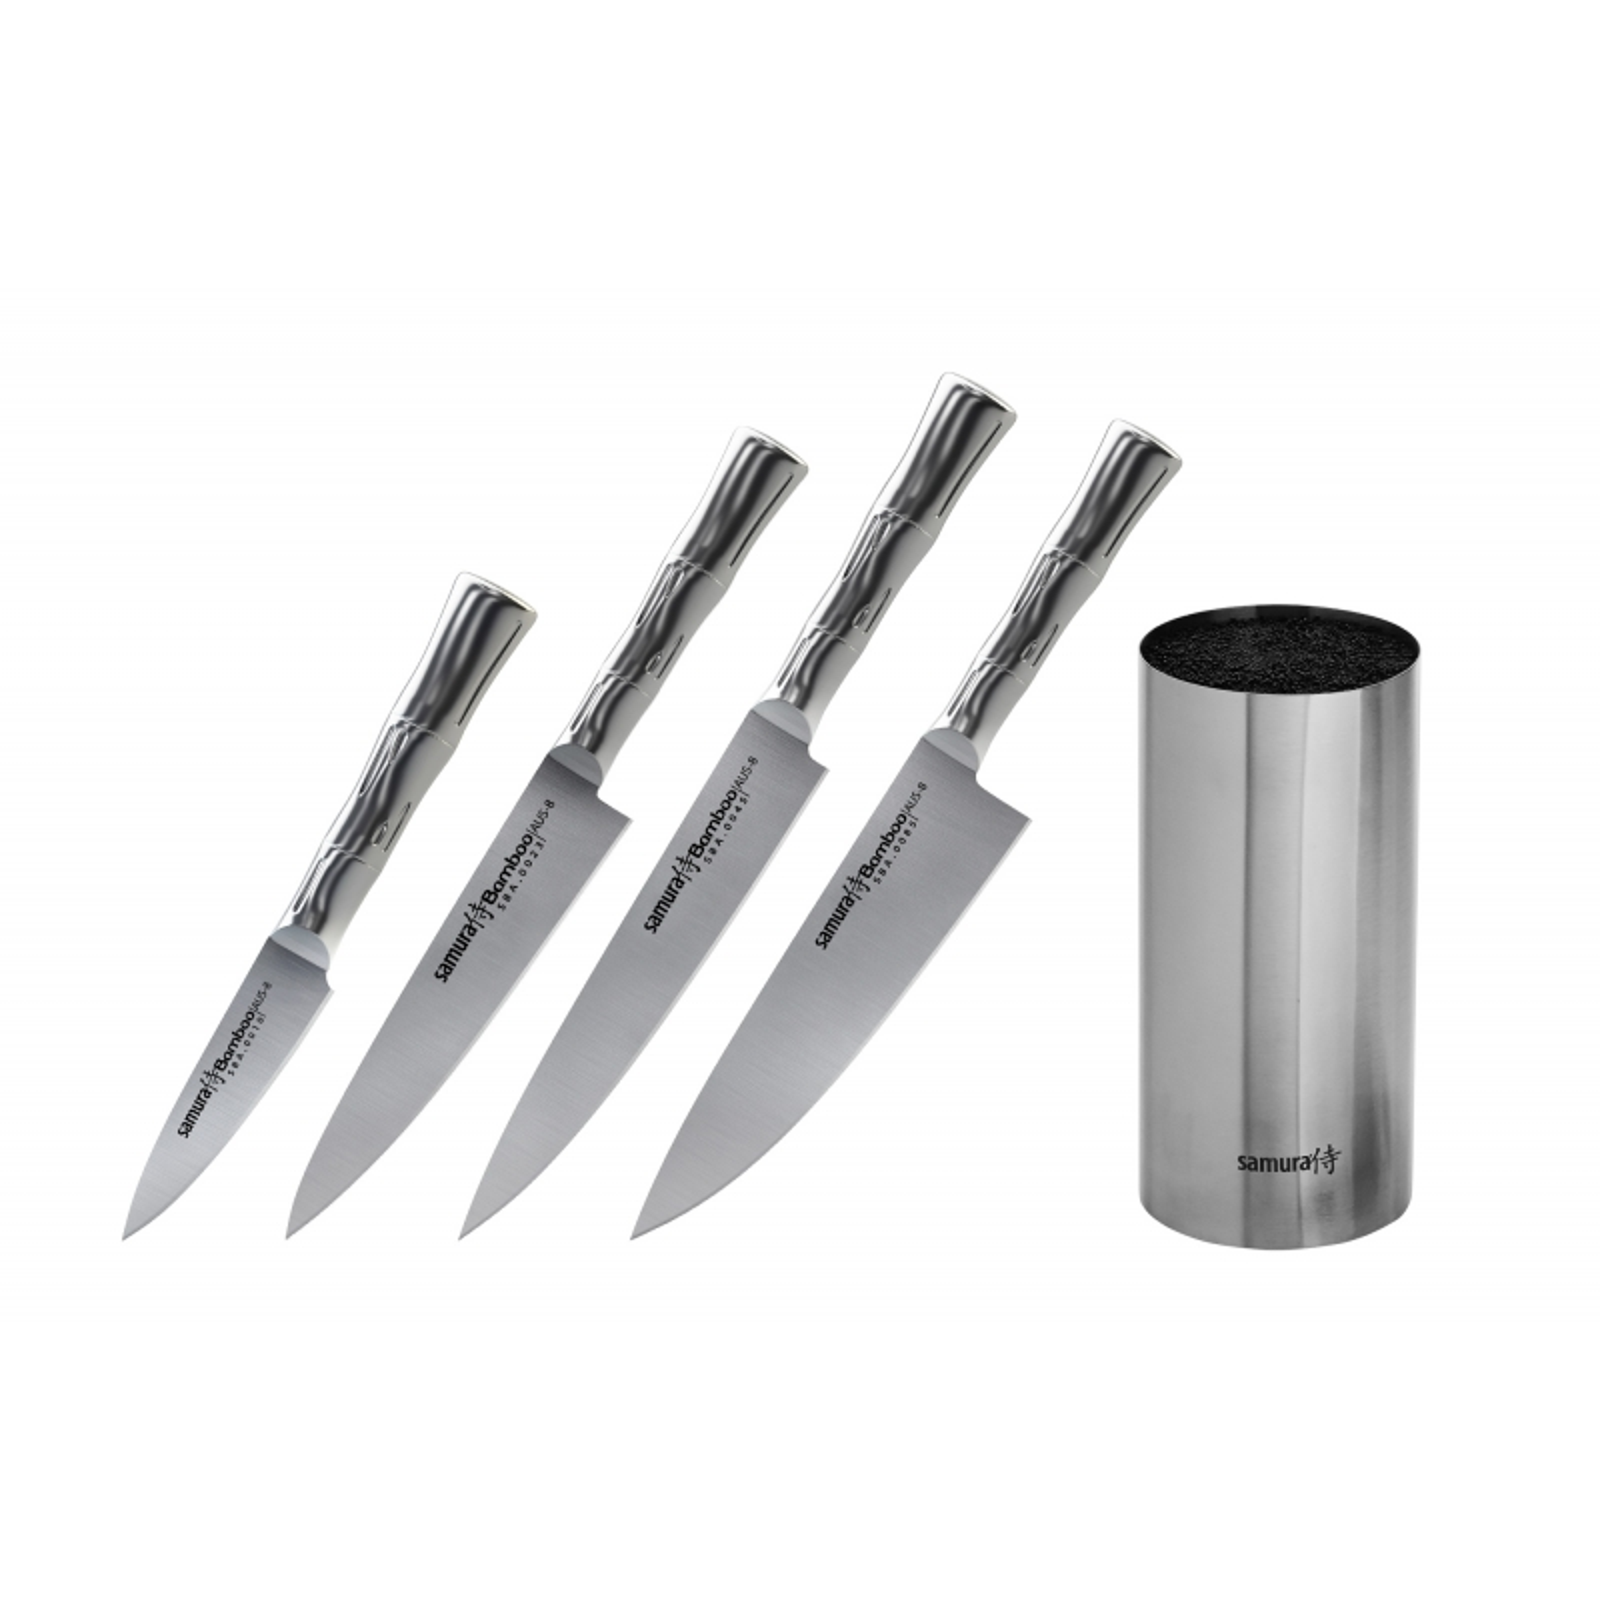 Комплект 4 ножей Samura BAMBOO, HRC 58